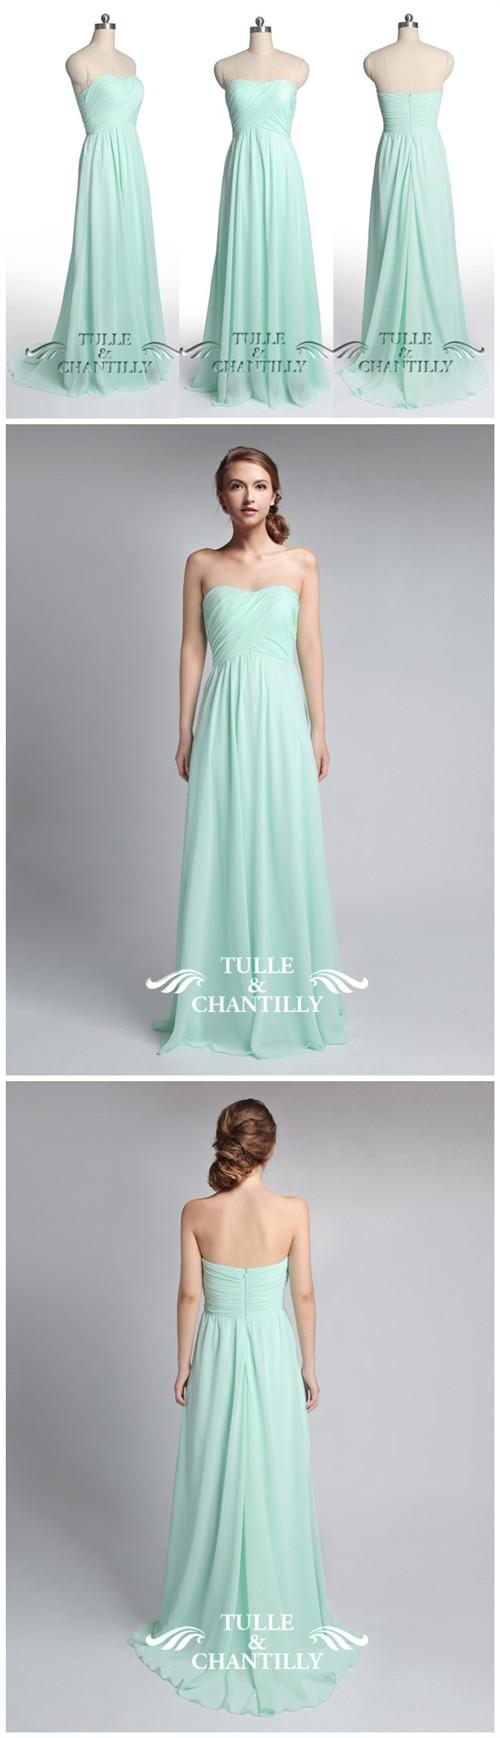 Chiffon Full Length Strapless Bridesmaid Dress TBQP284 | Mint green ...